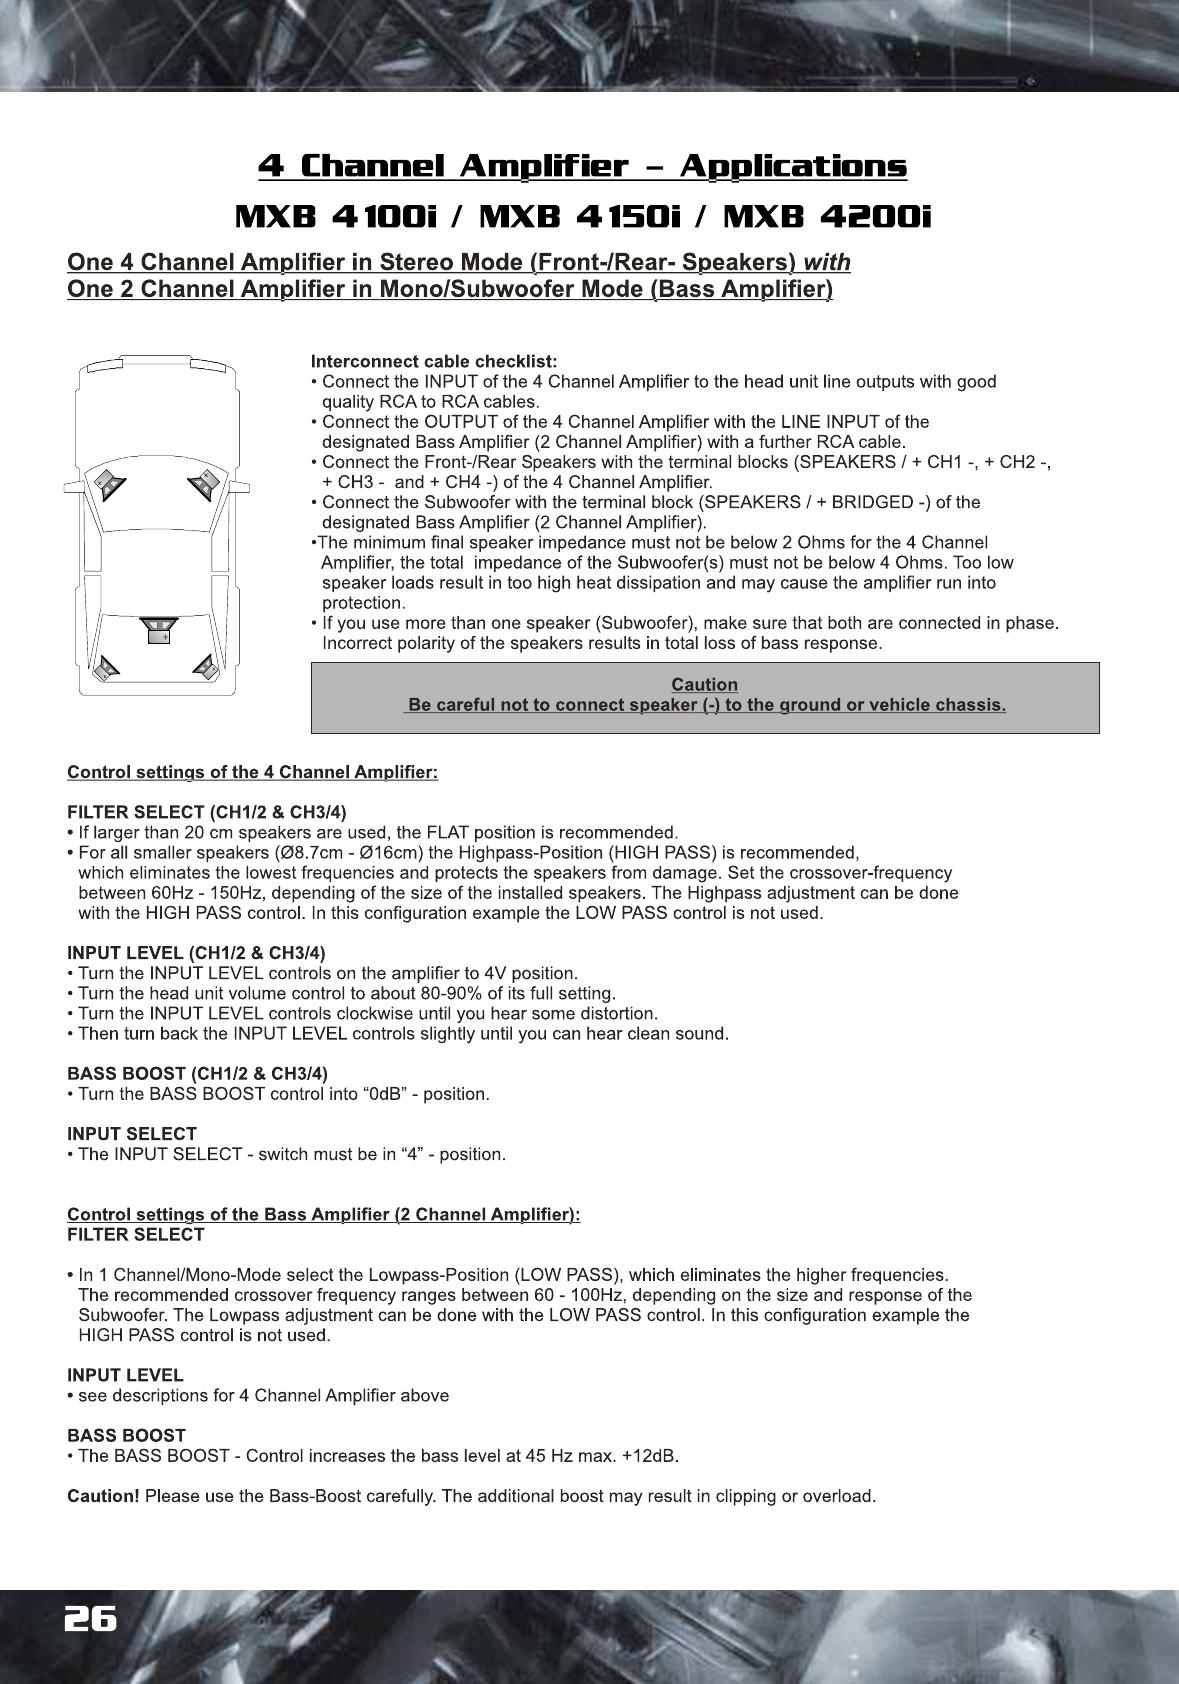 Manual Crunch MXB 4150 I (page 27 of 32) (German, English)